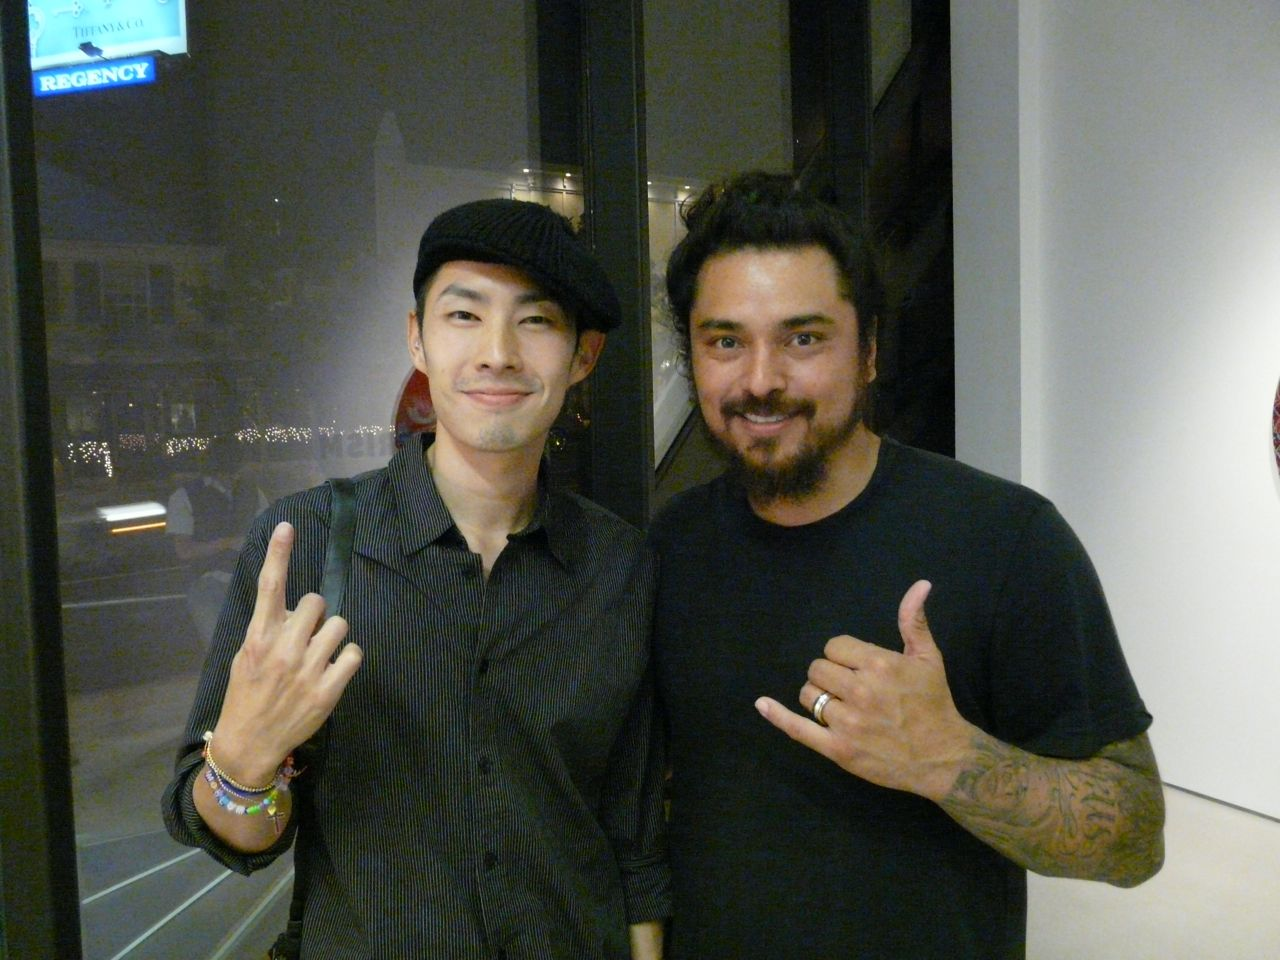 Vanness Wu & PM Tenore (RVCA)